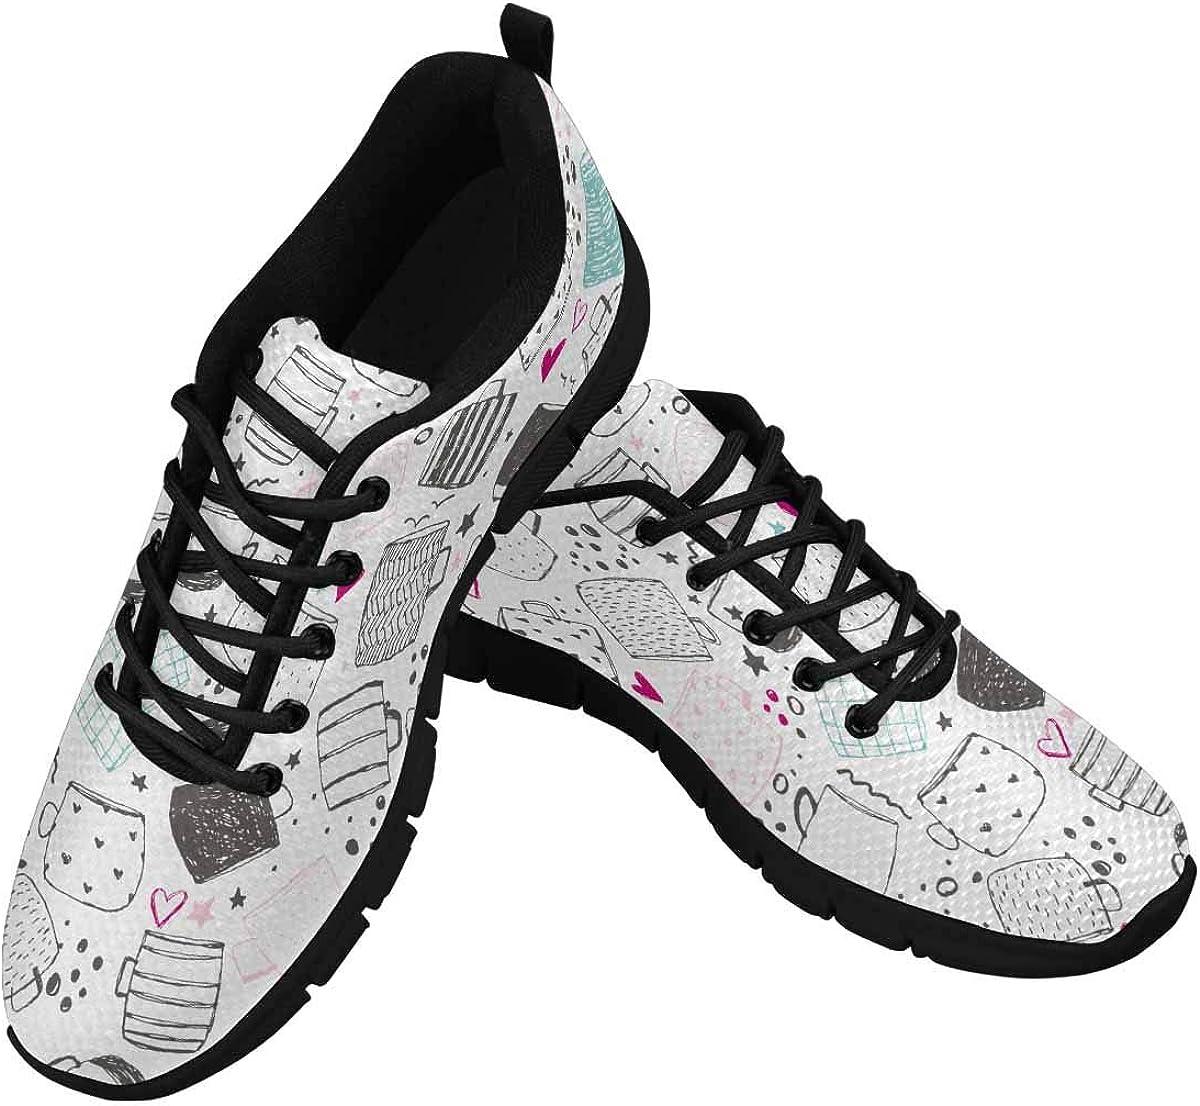 InterestPrint Mug Pattern Women's Lightweight Athletic Casual Gym Sneakers